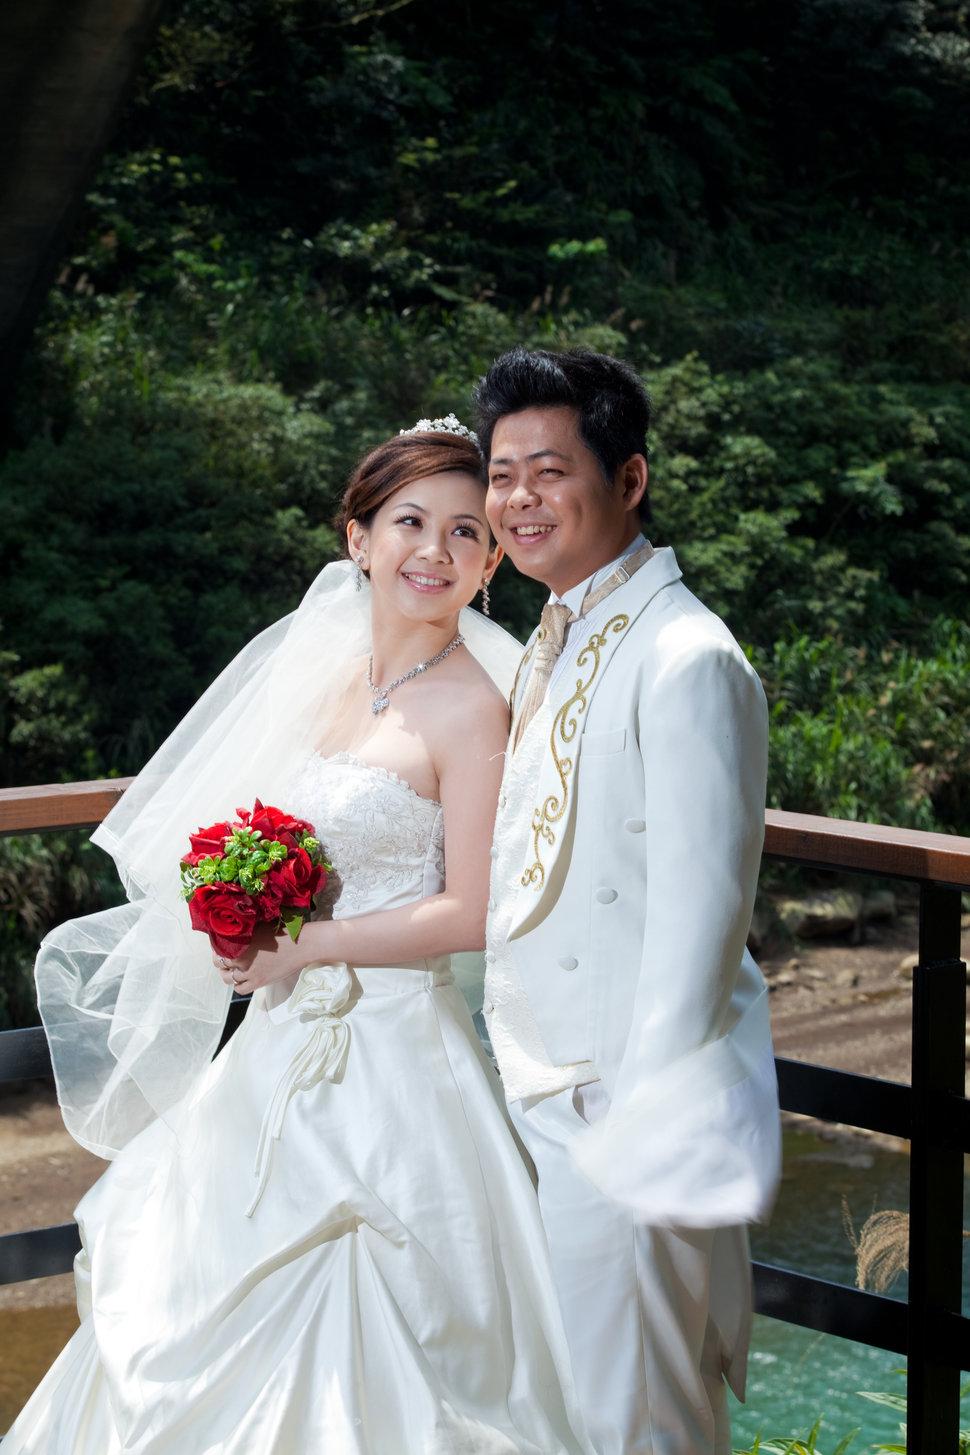 IMG_4525 - 全台最便宜-45DESIGN四五婚紗禮服《結婚吧》